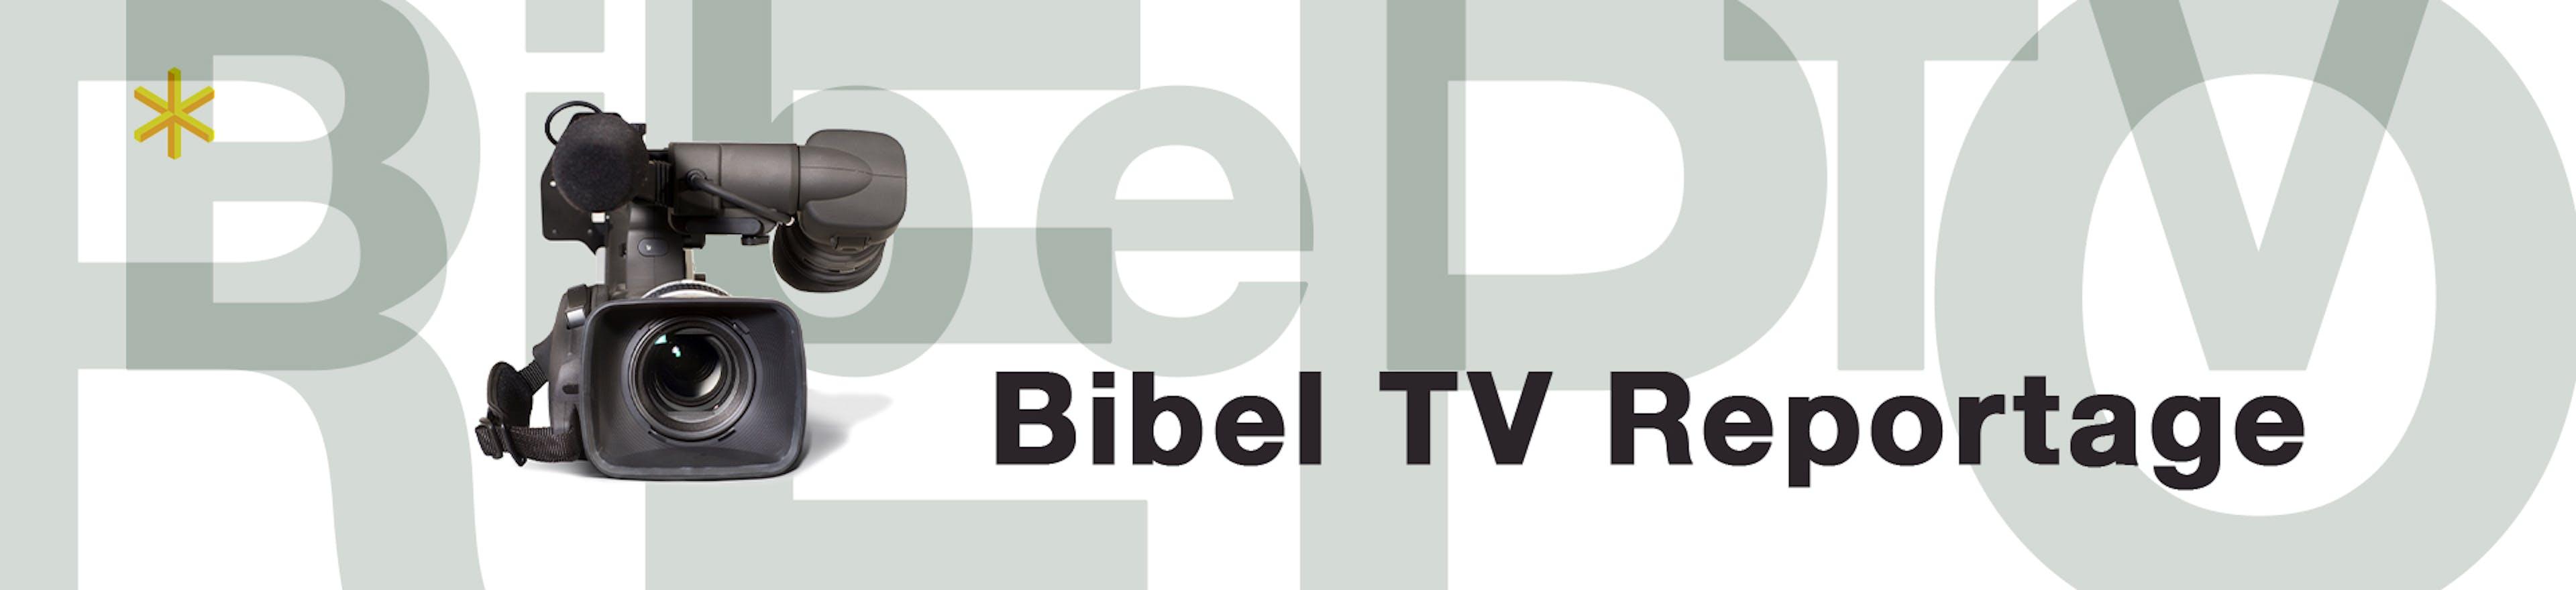 Bibel TV Reportage